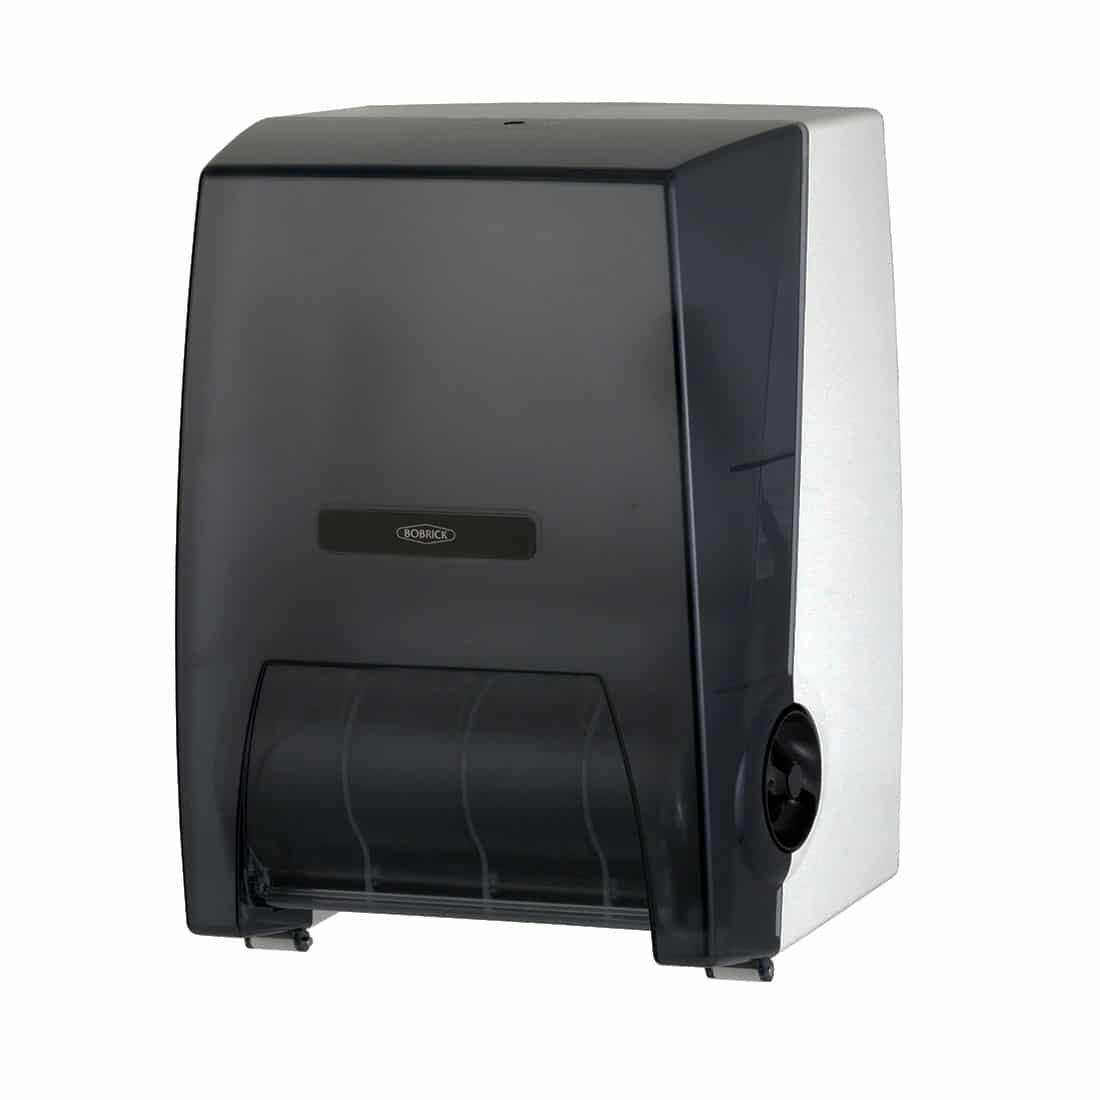 Bobrick Surface Roll Paper Towel Dispenser B 72860